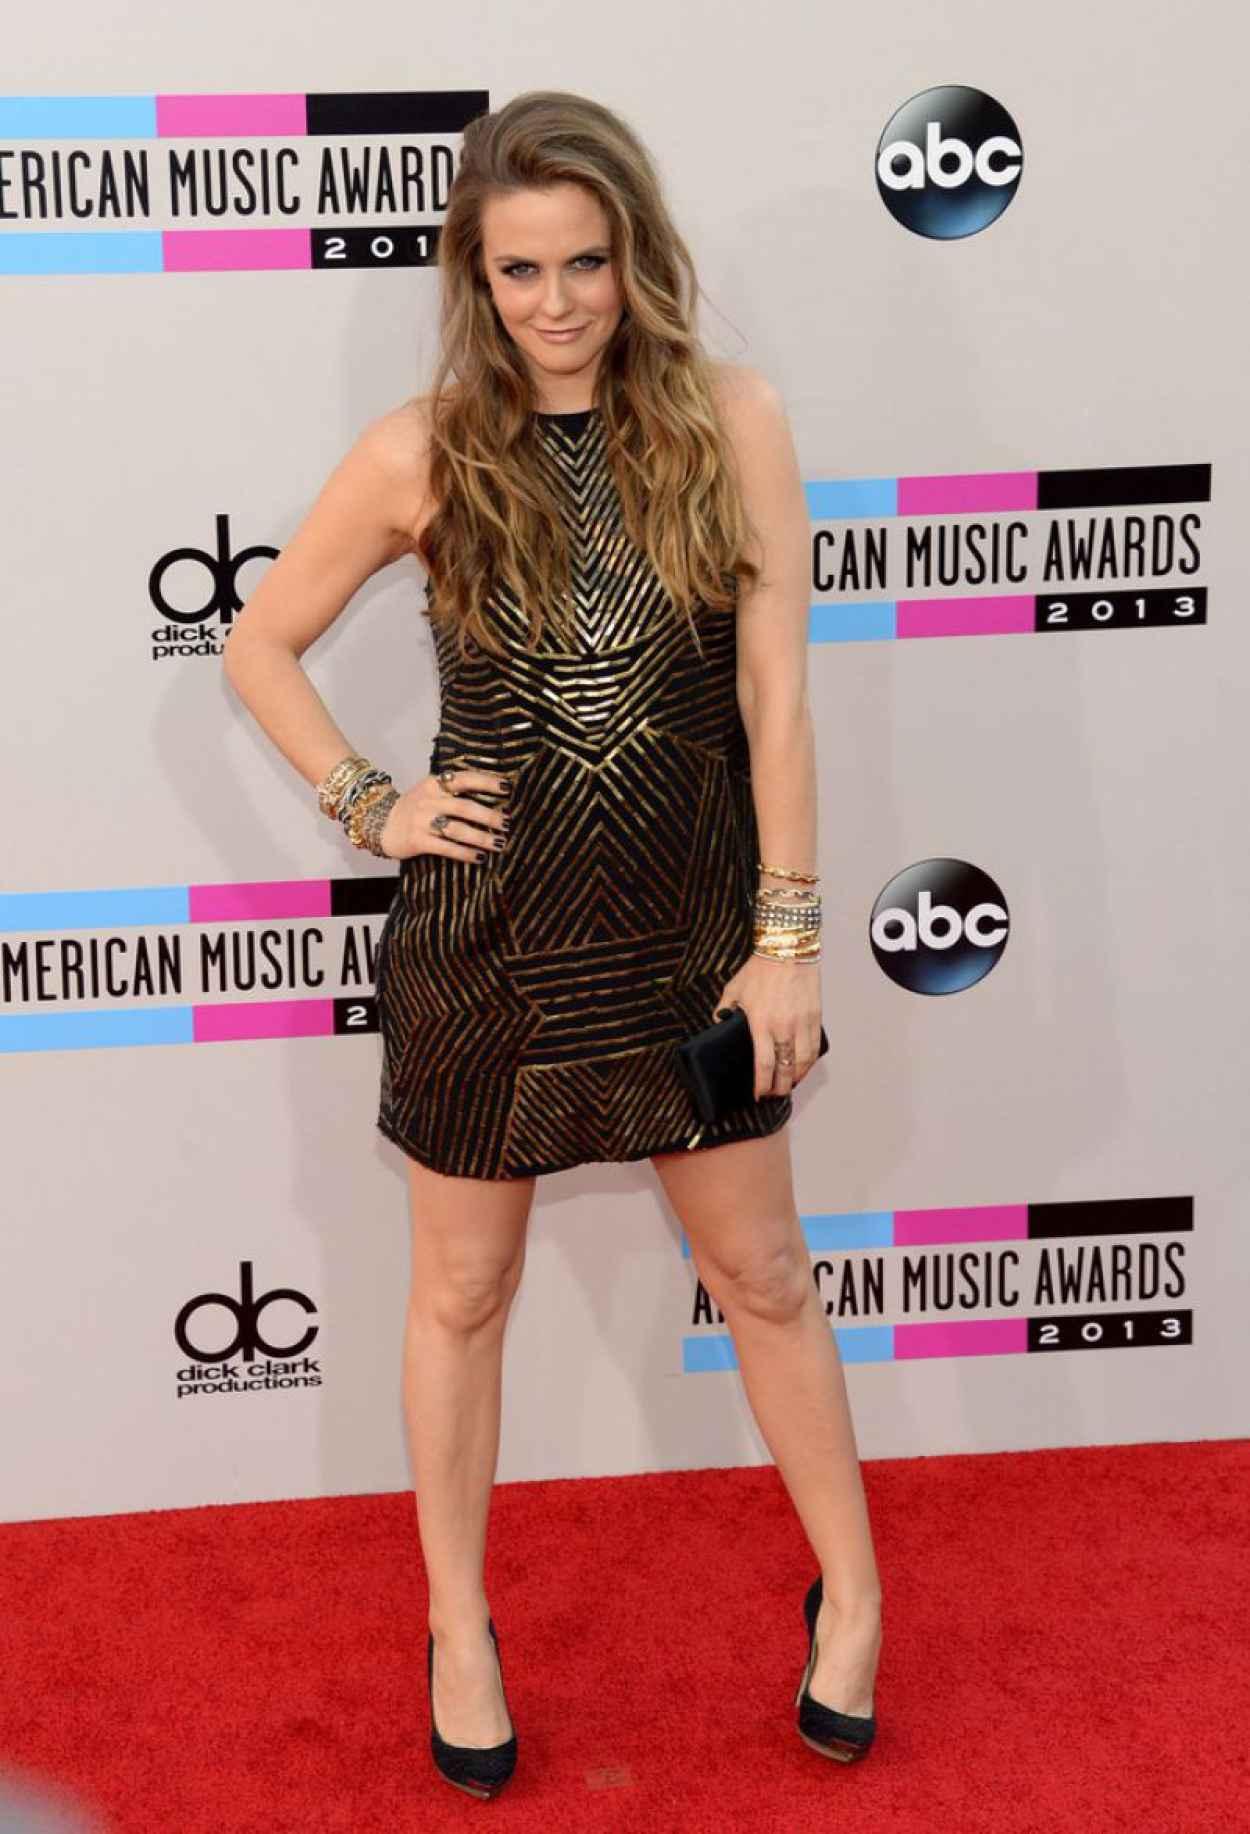 Alicia Silverstone Attends 2015 American Music Awards-2